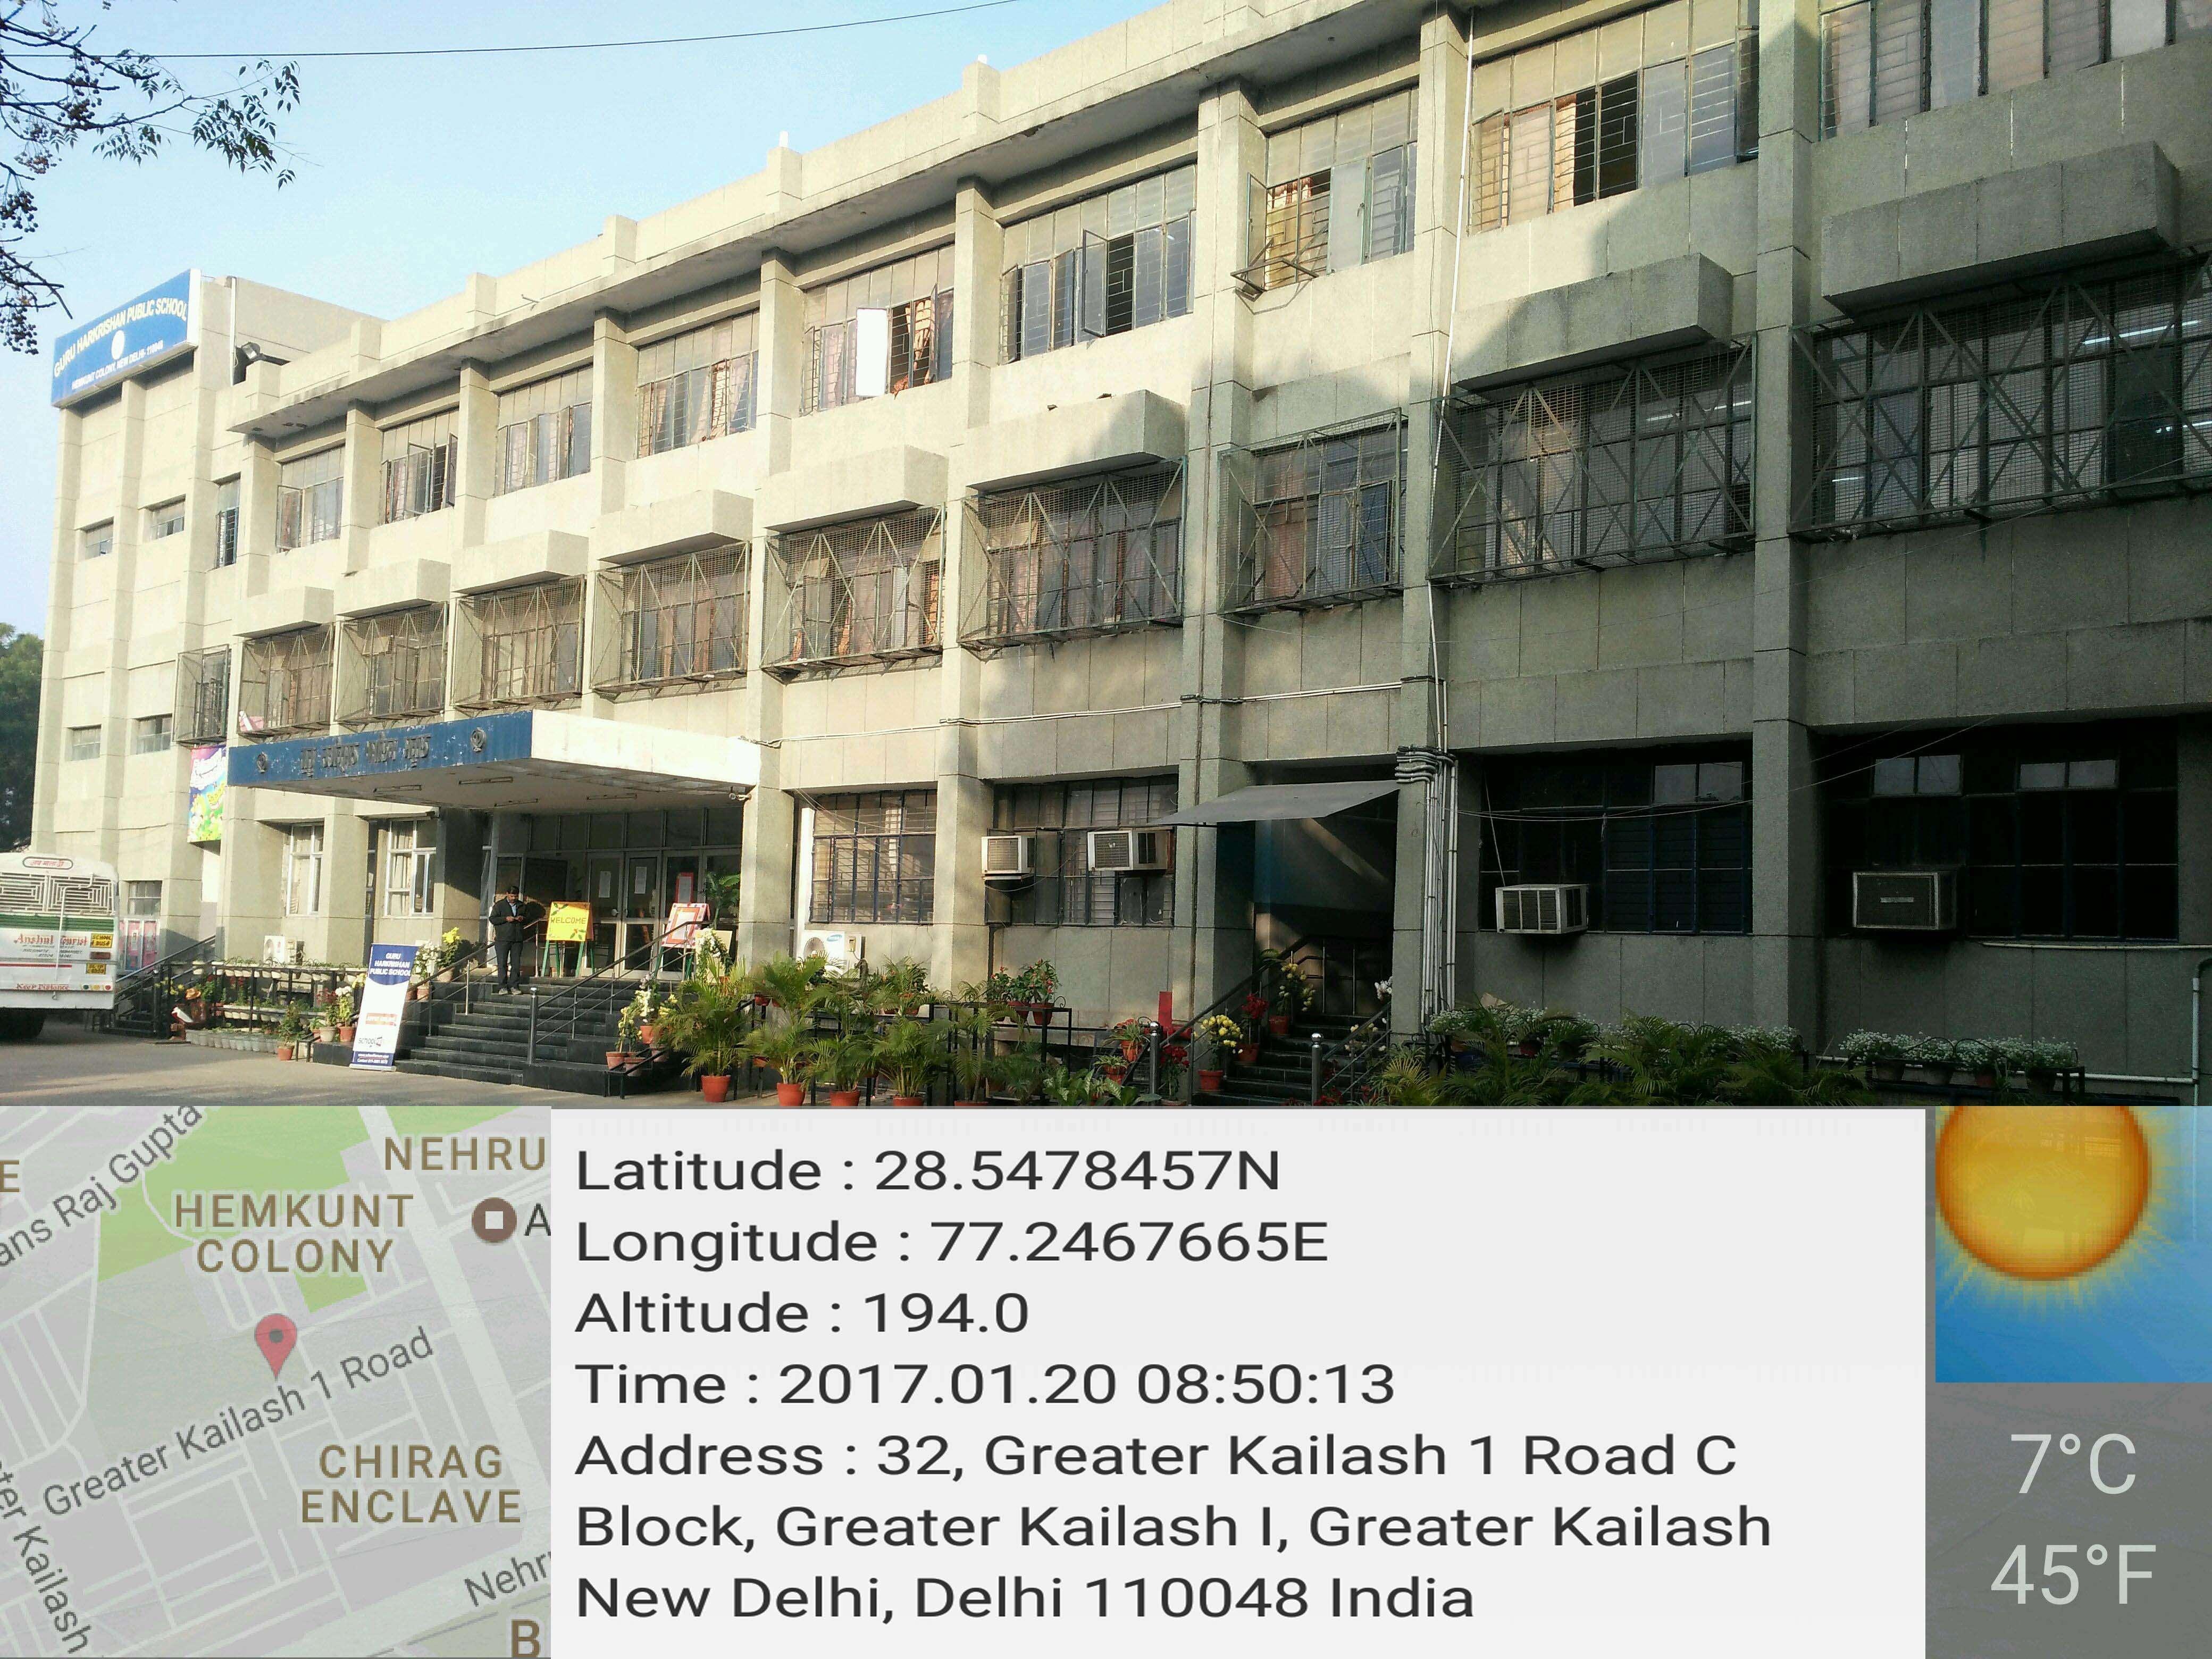 GURU HAR KRISHAN PUBLIC SCHOOL HEMKUNT COLONY NEW DELHI 2730284